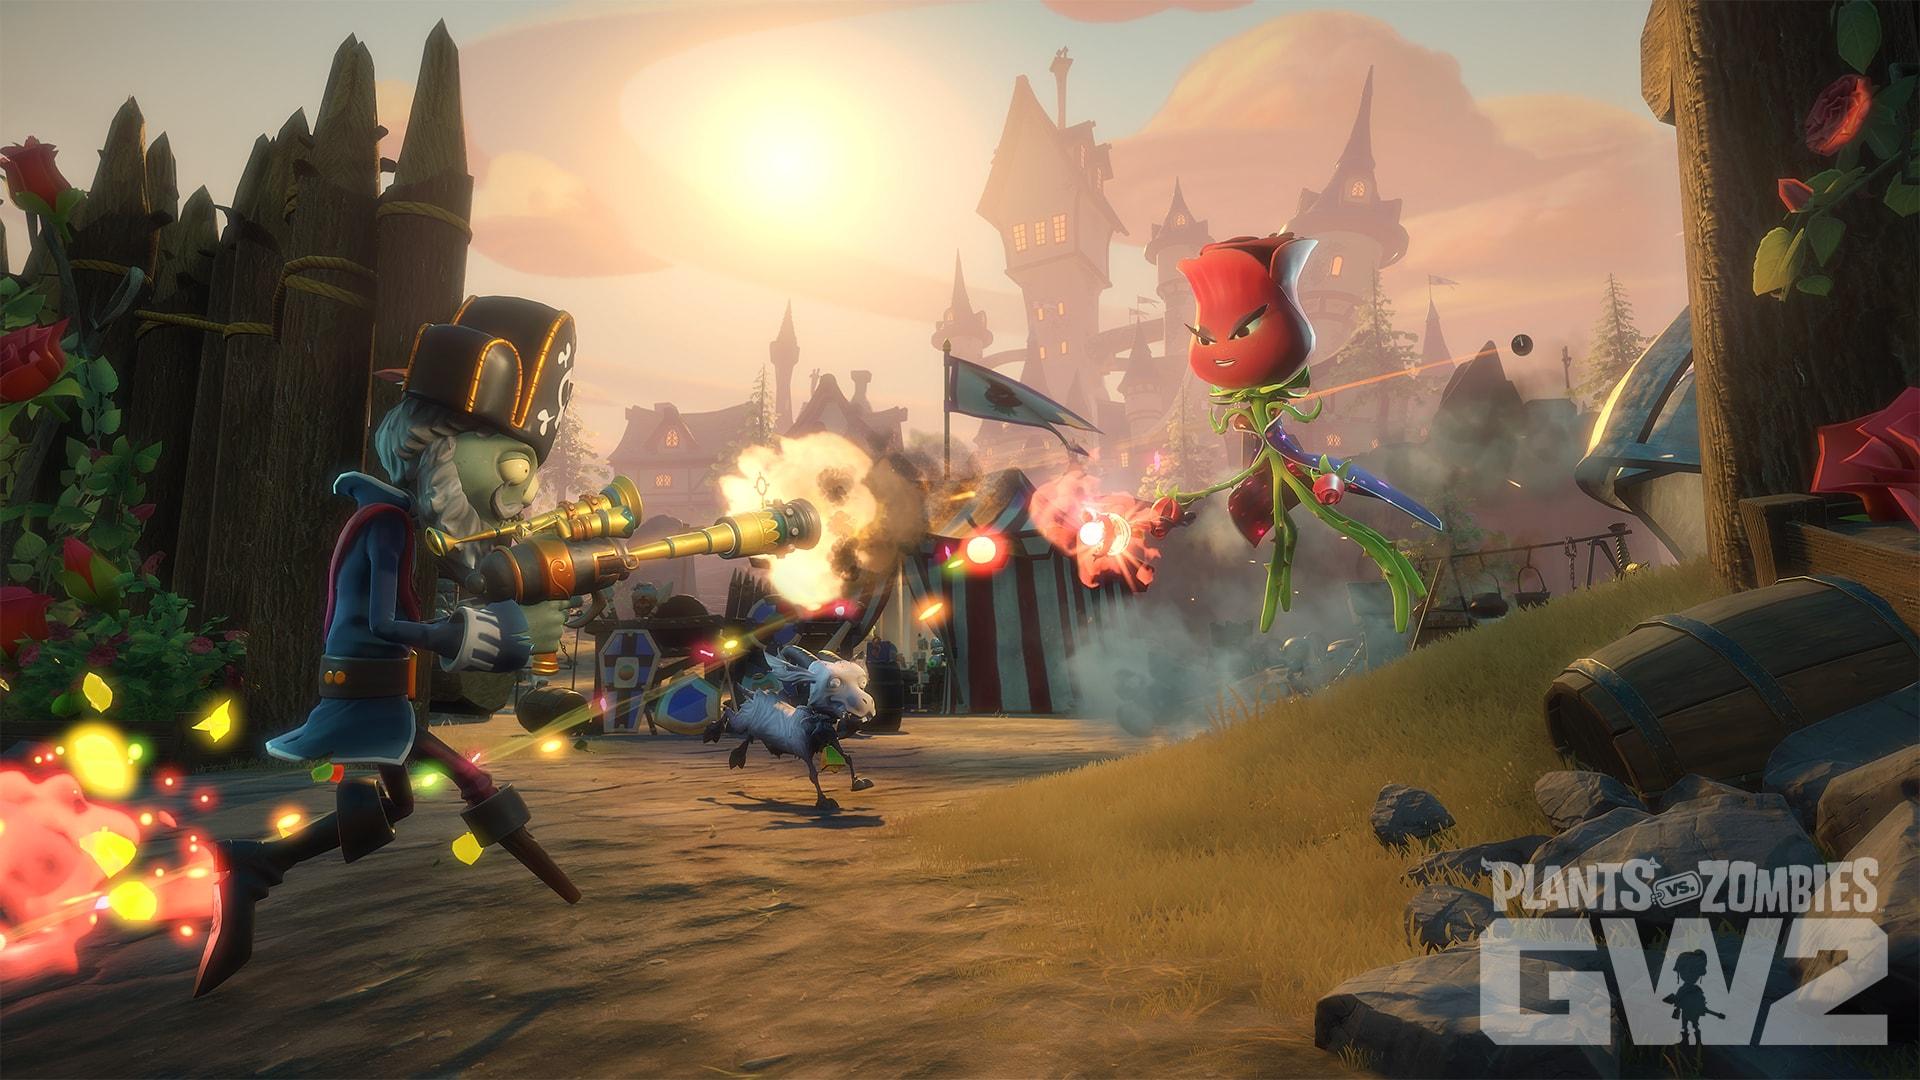 Plants vs. Zombies: Garden Warfare 2 Widescreen for desktop